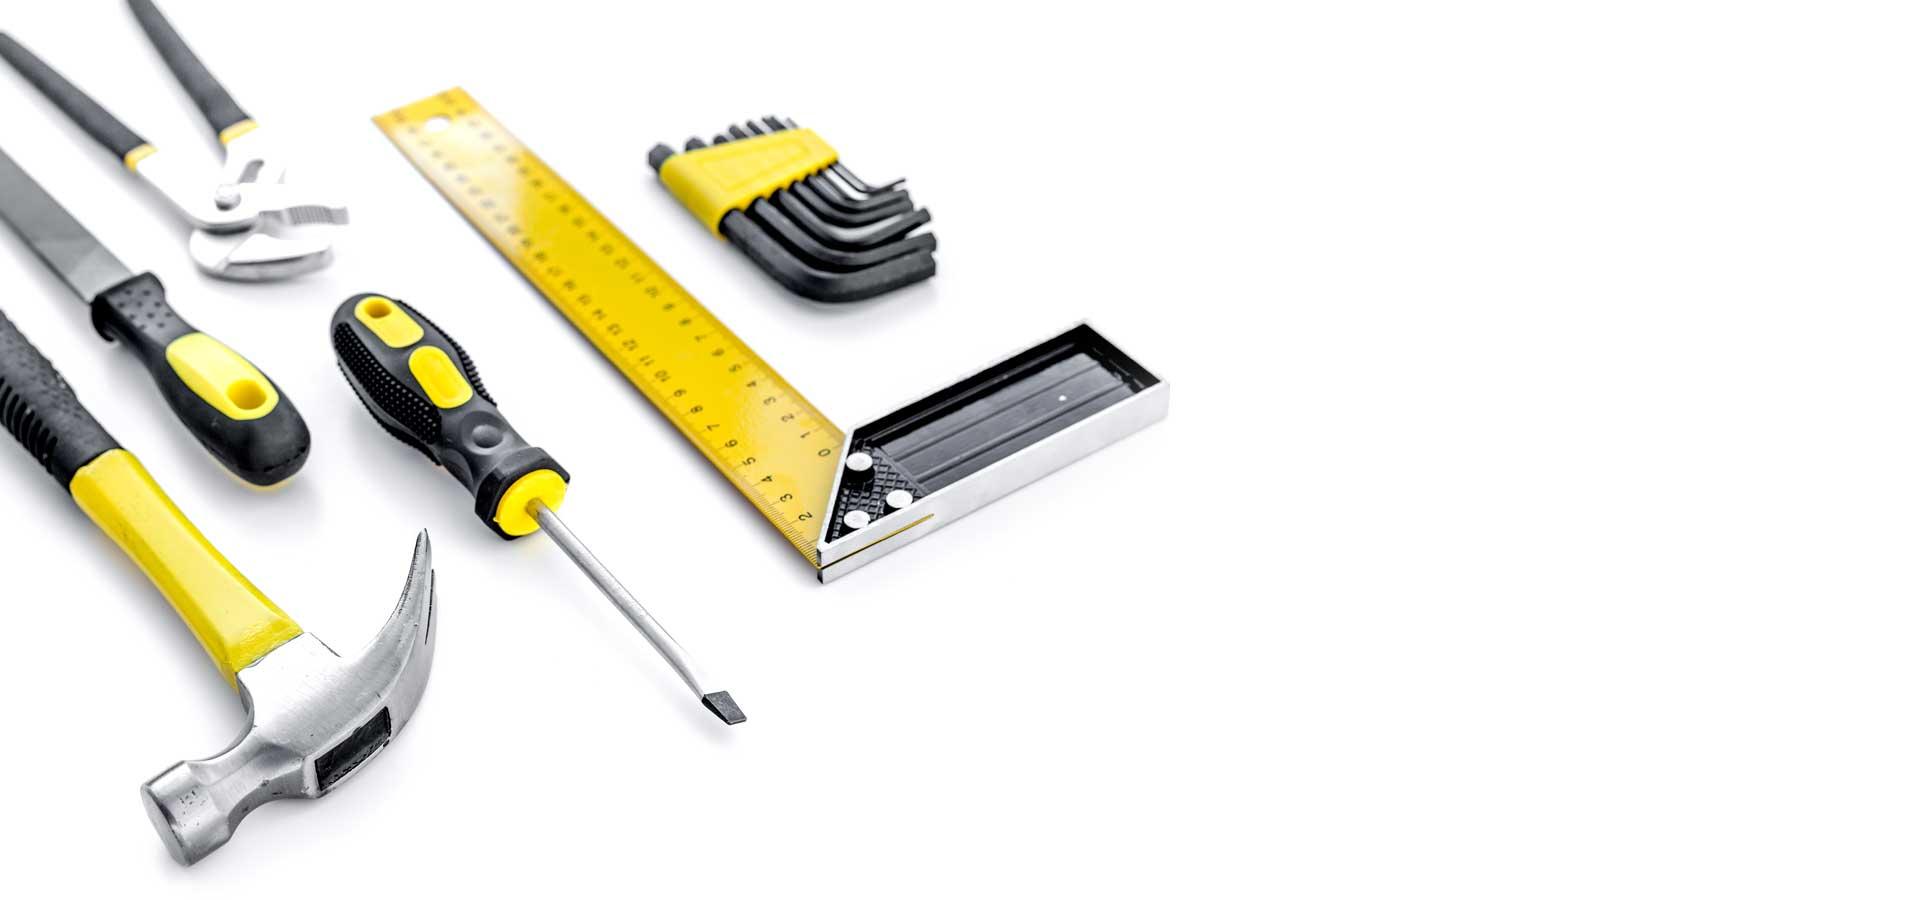 Builder's tools